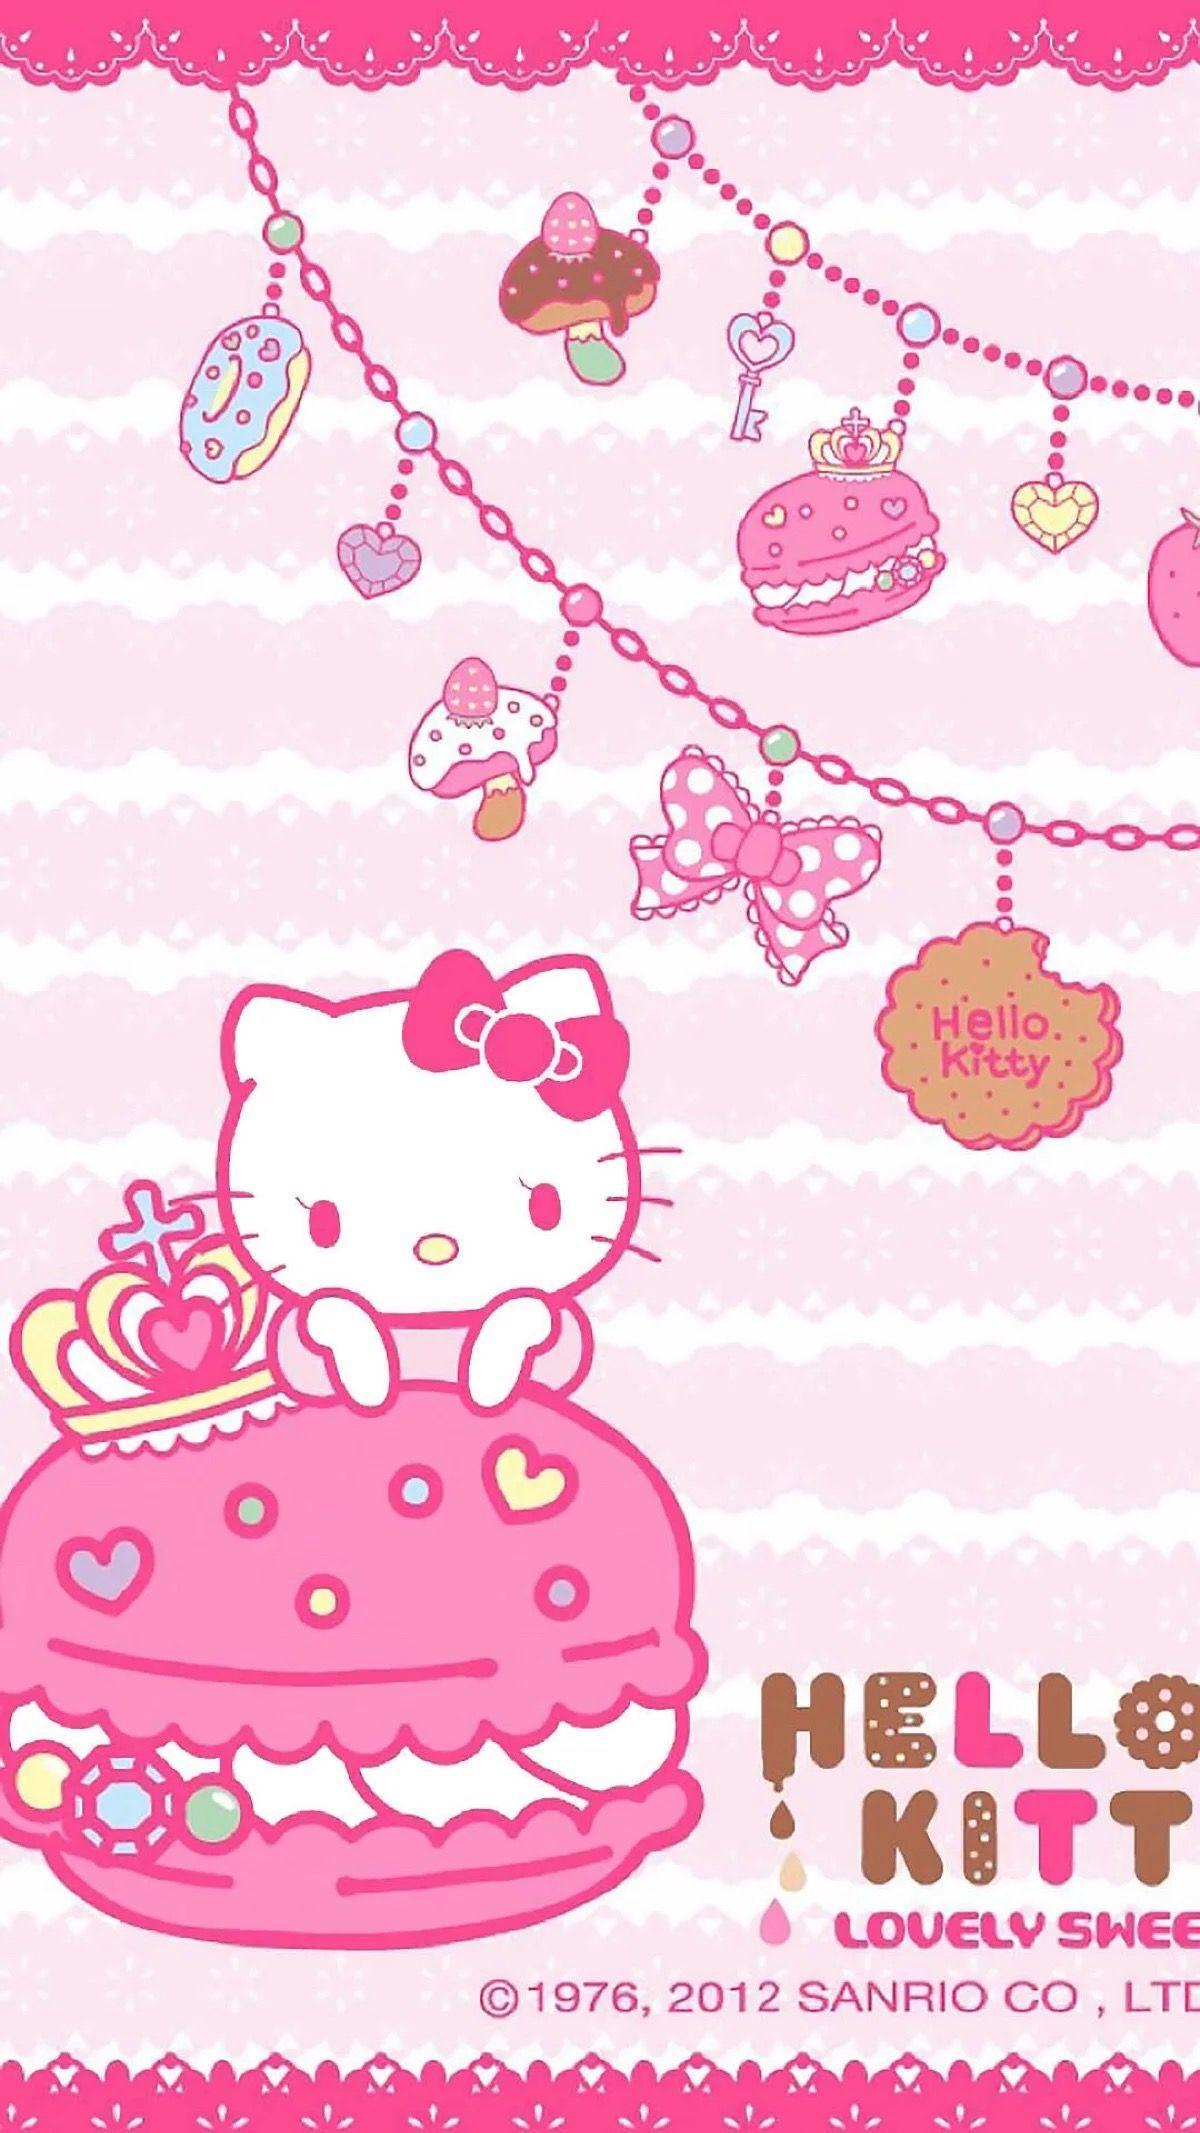 Most Inspiring Wallpaper Hello Kitty Computer - c1144fdc12cc8425361d063bbf69ab48  Snapshot_246371.jpg